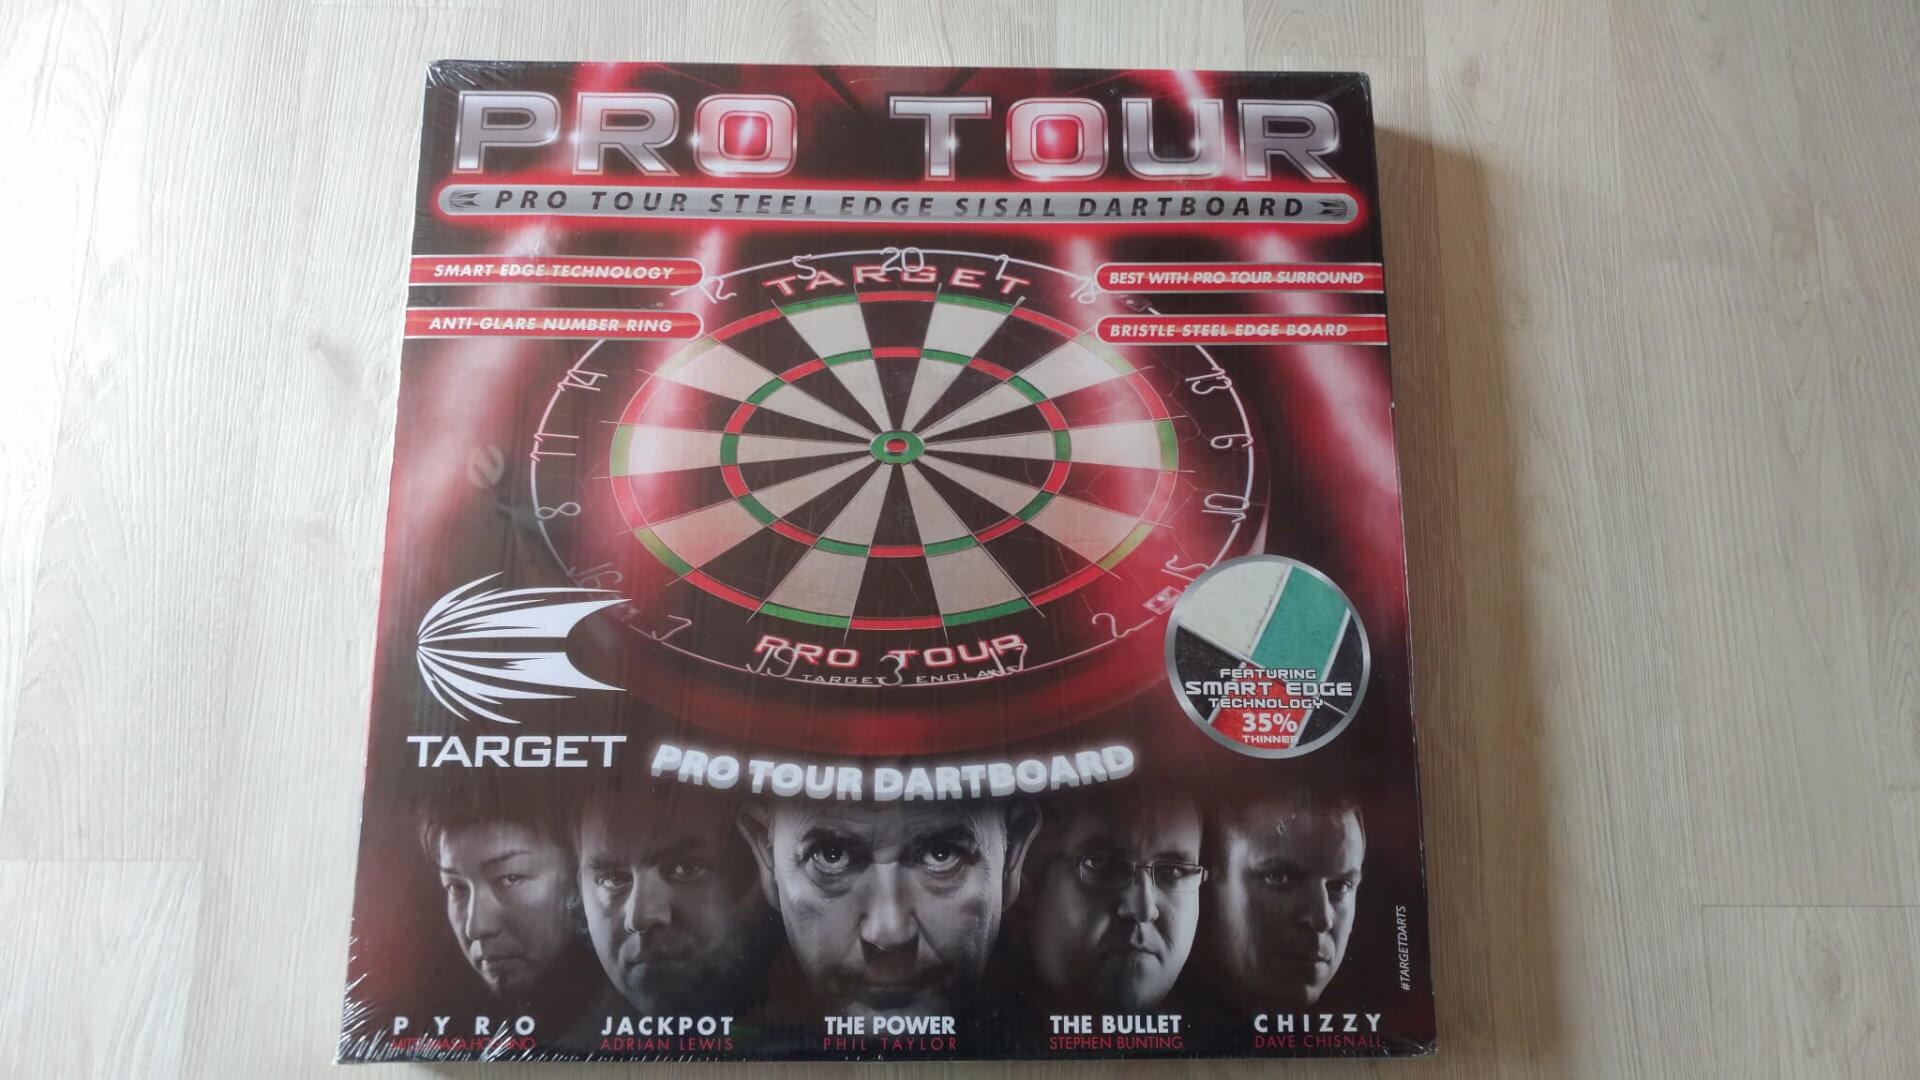 Target - Pro Tour Dartboard